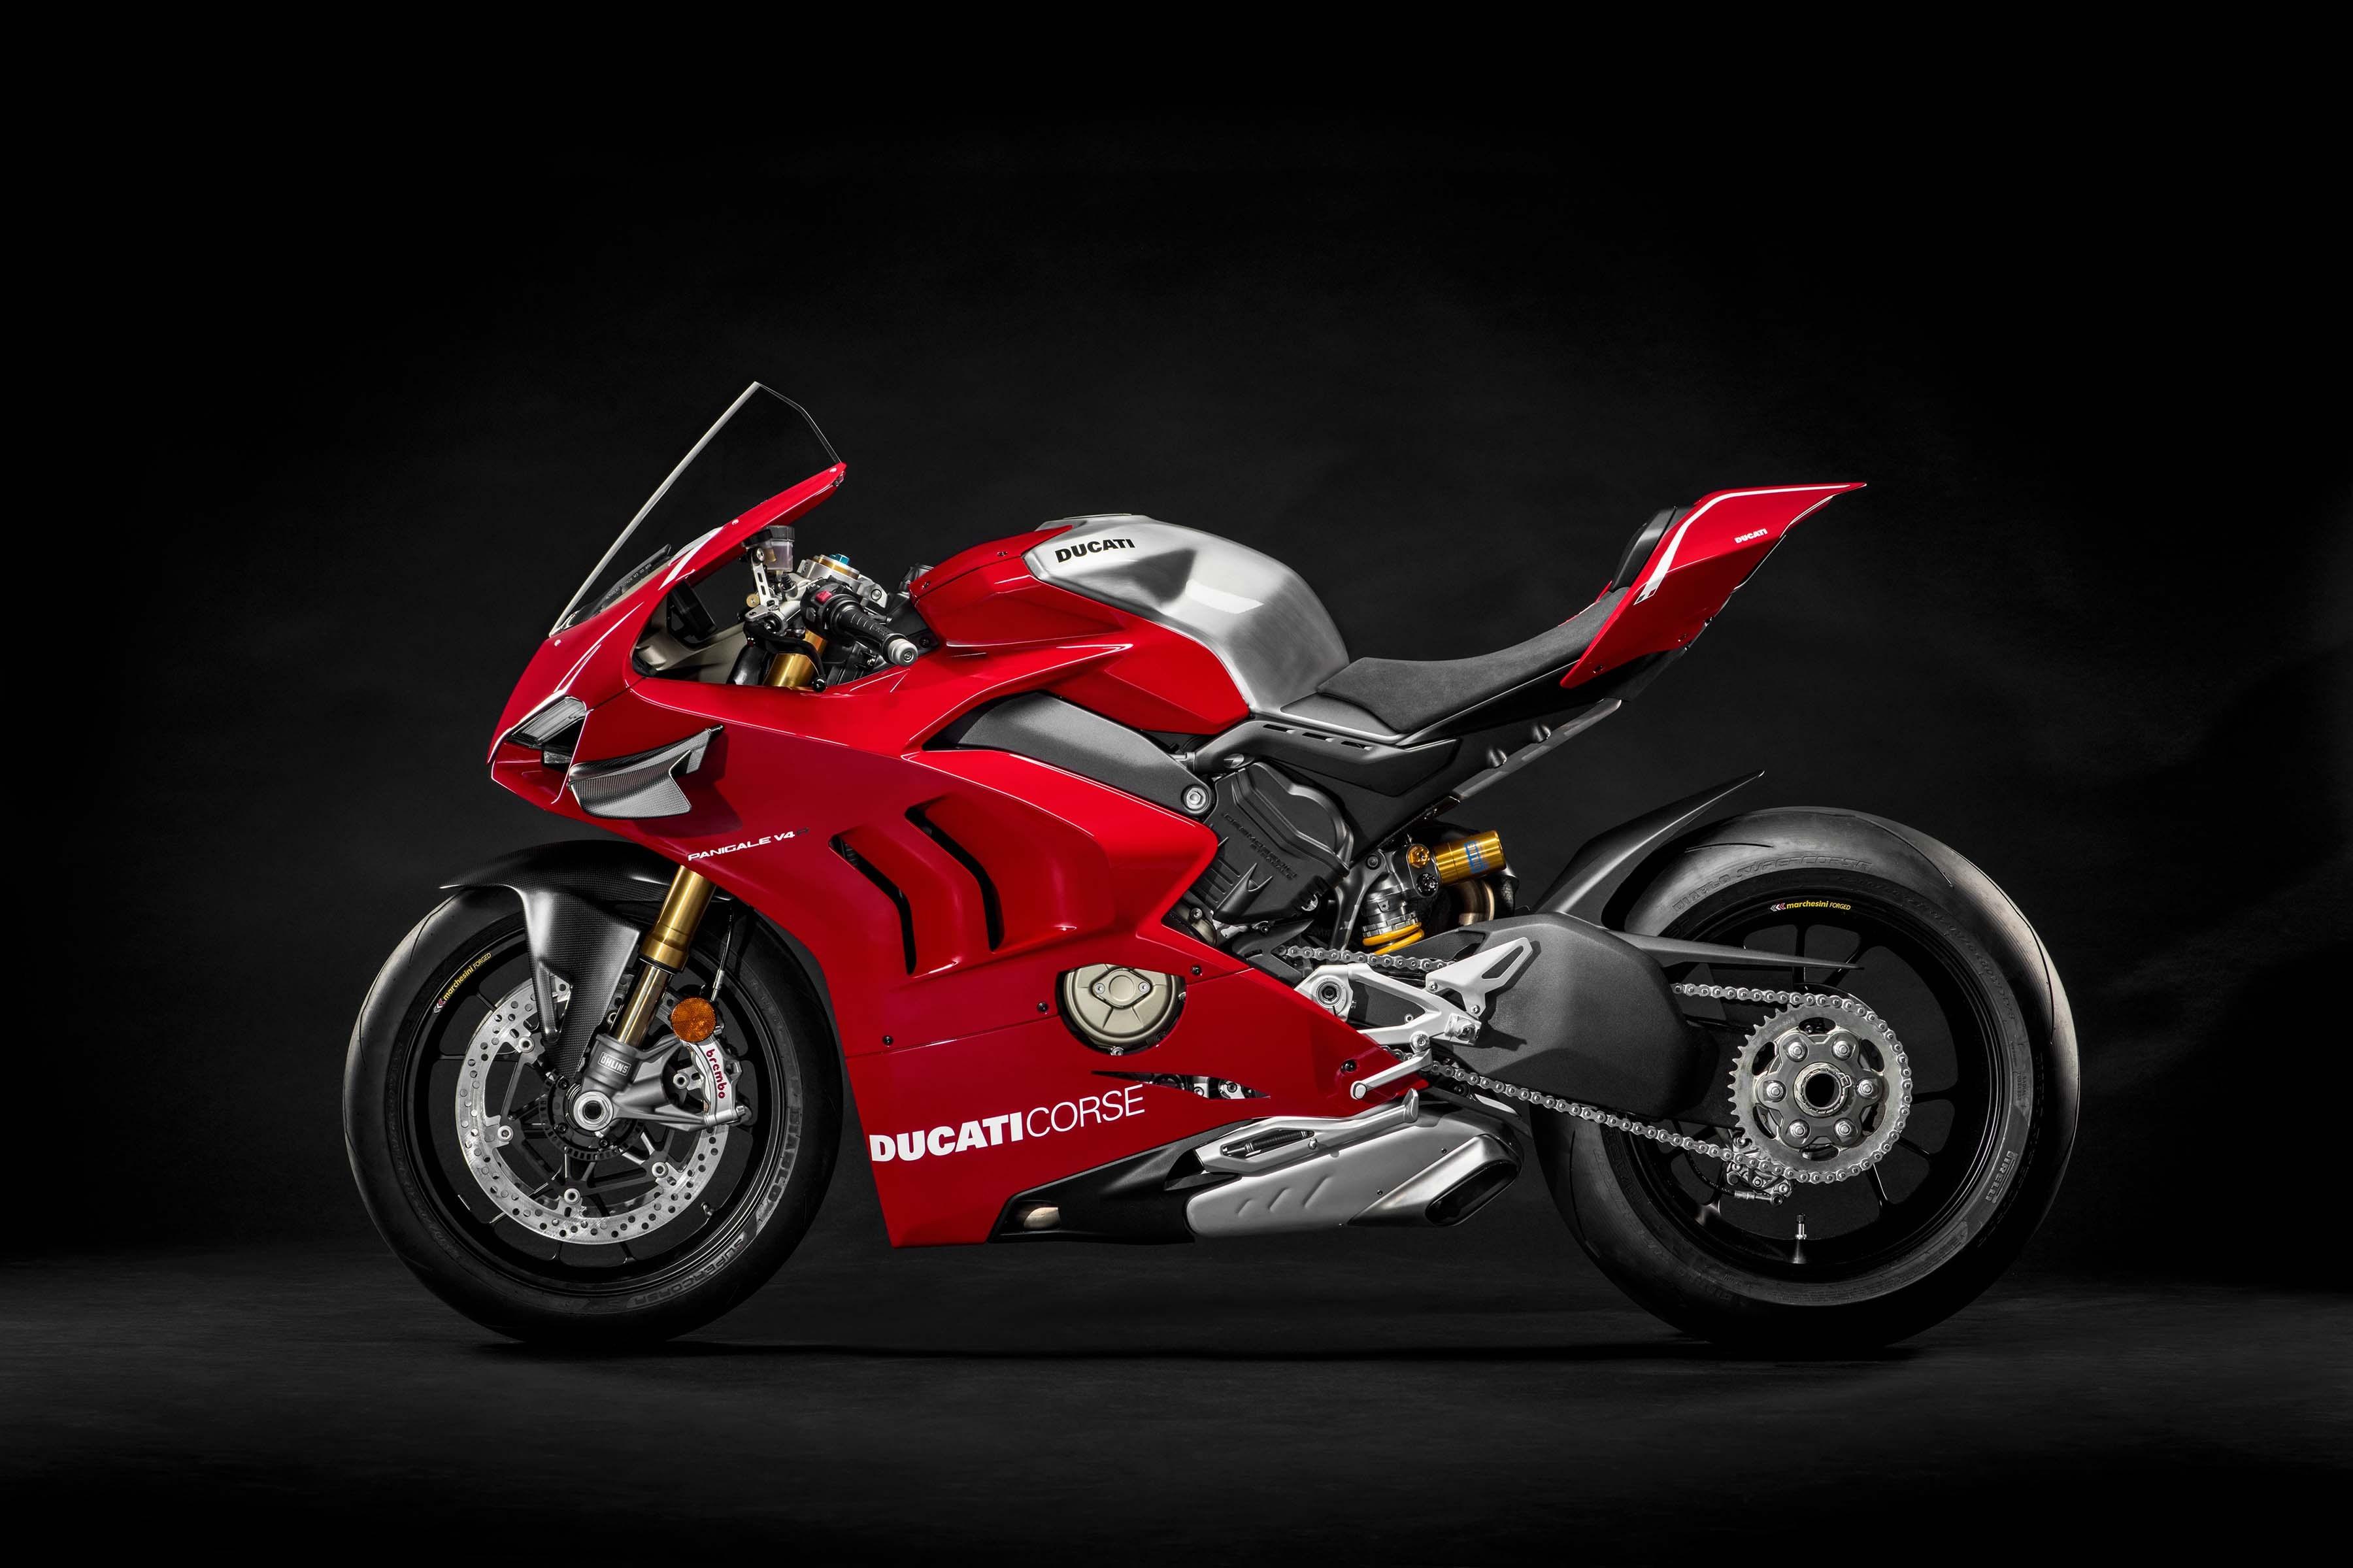 2019 Ducati Panigale V4 R Debuts at World Ducati Première ...